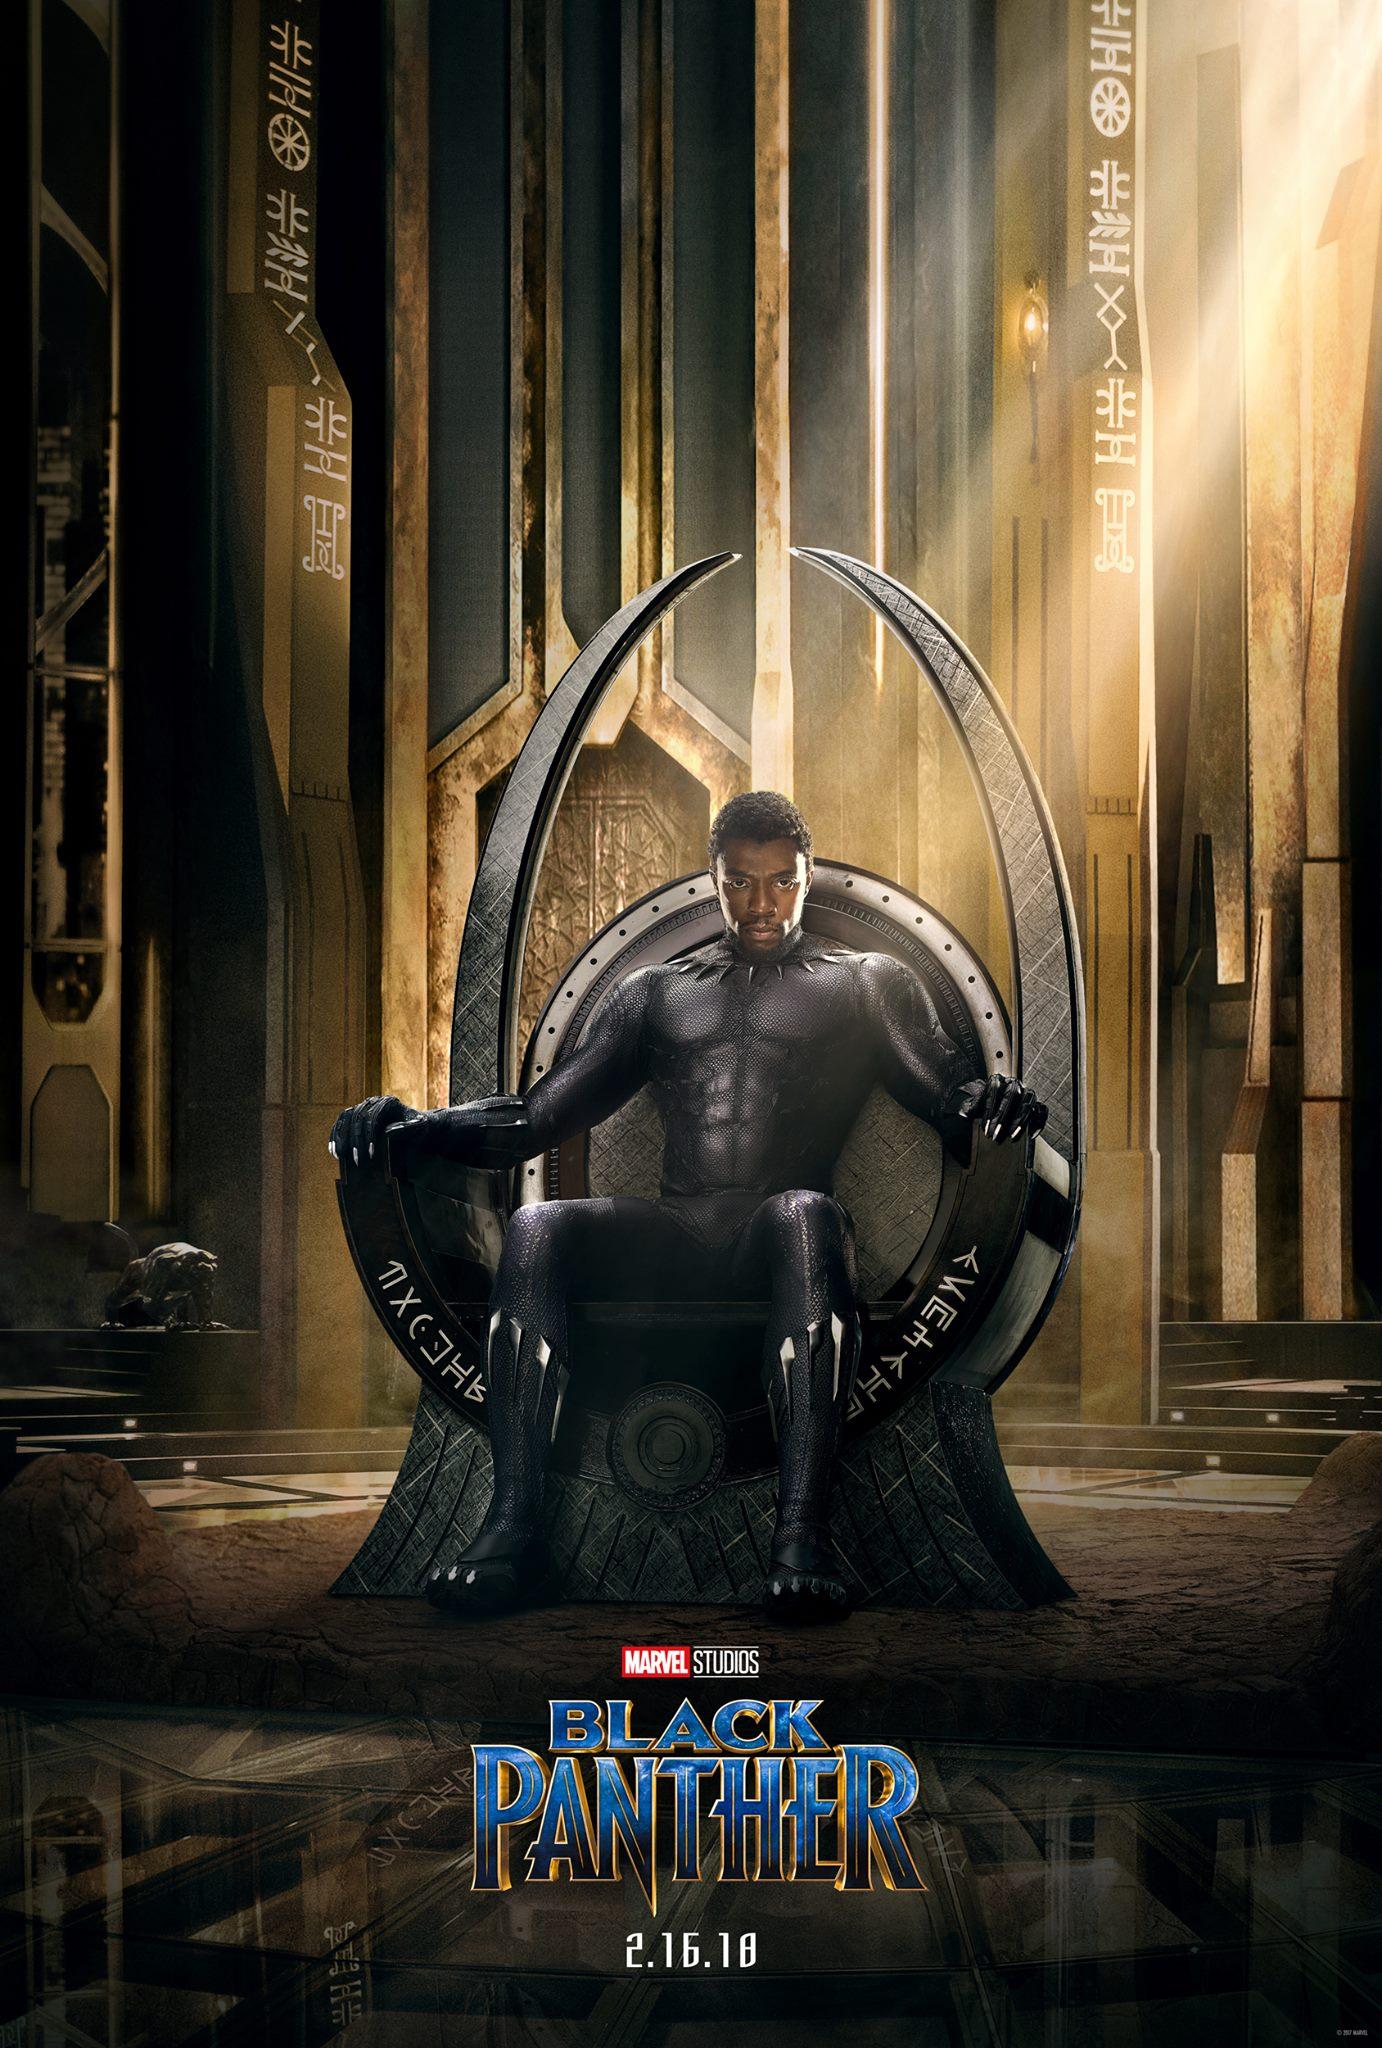 Black Panther Poster ปกหนังแรก